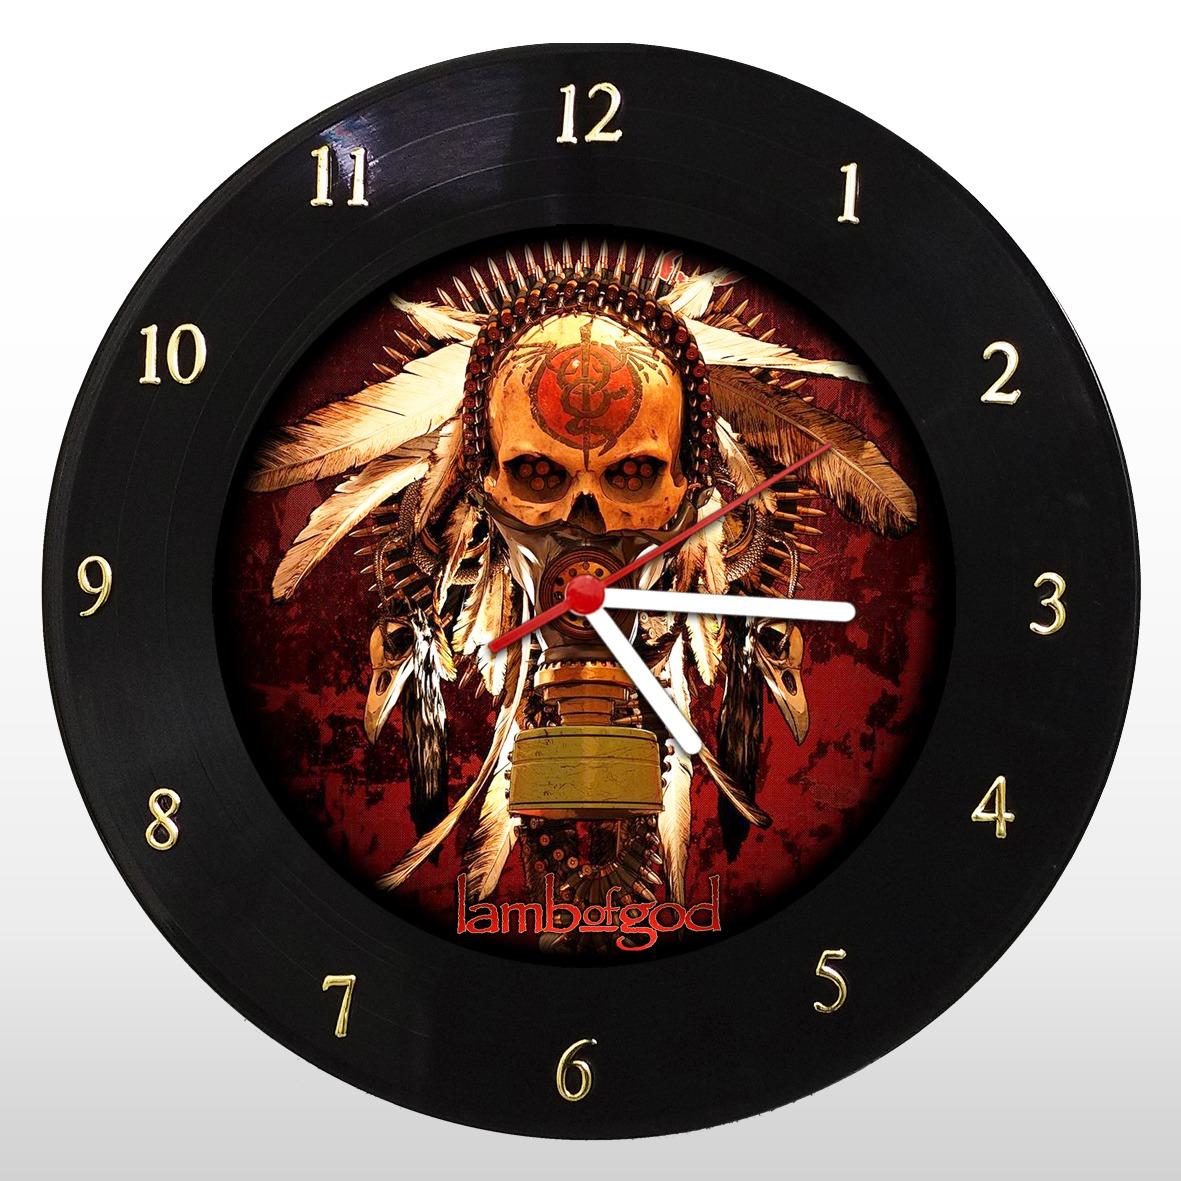 Lamb of God - Relógio de Parede em Disco de Vinil - Mr. Rock